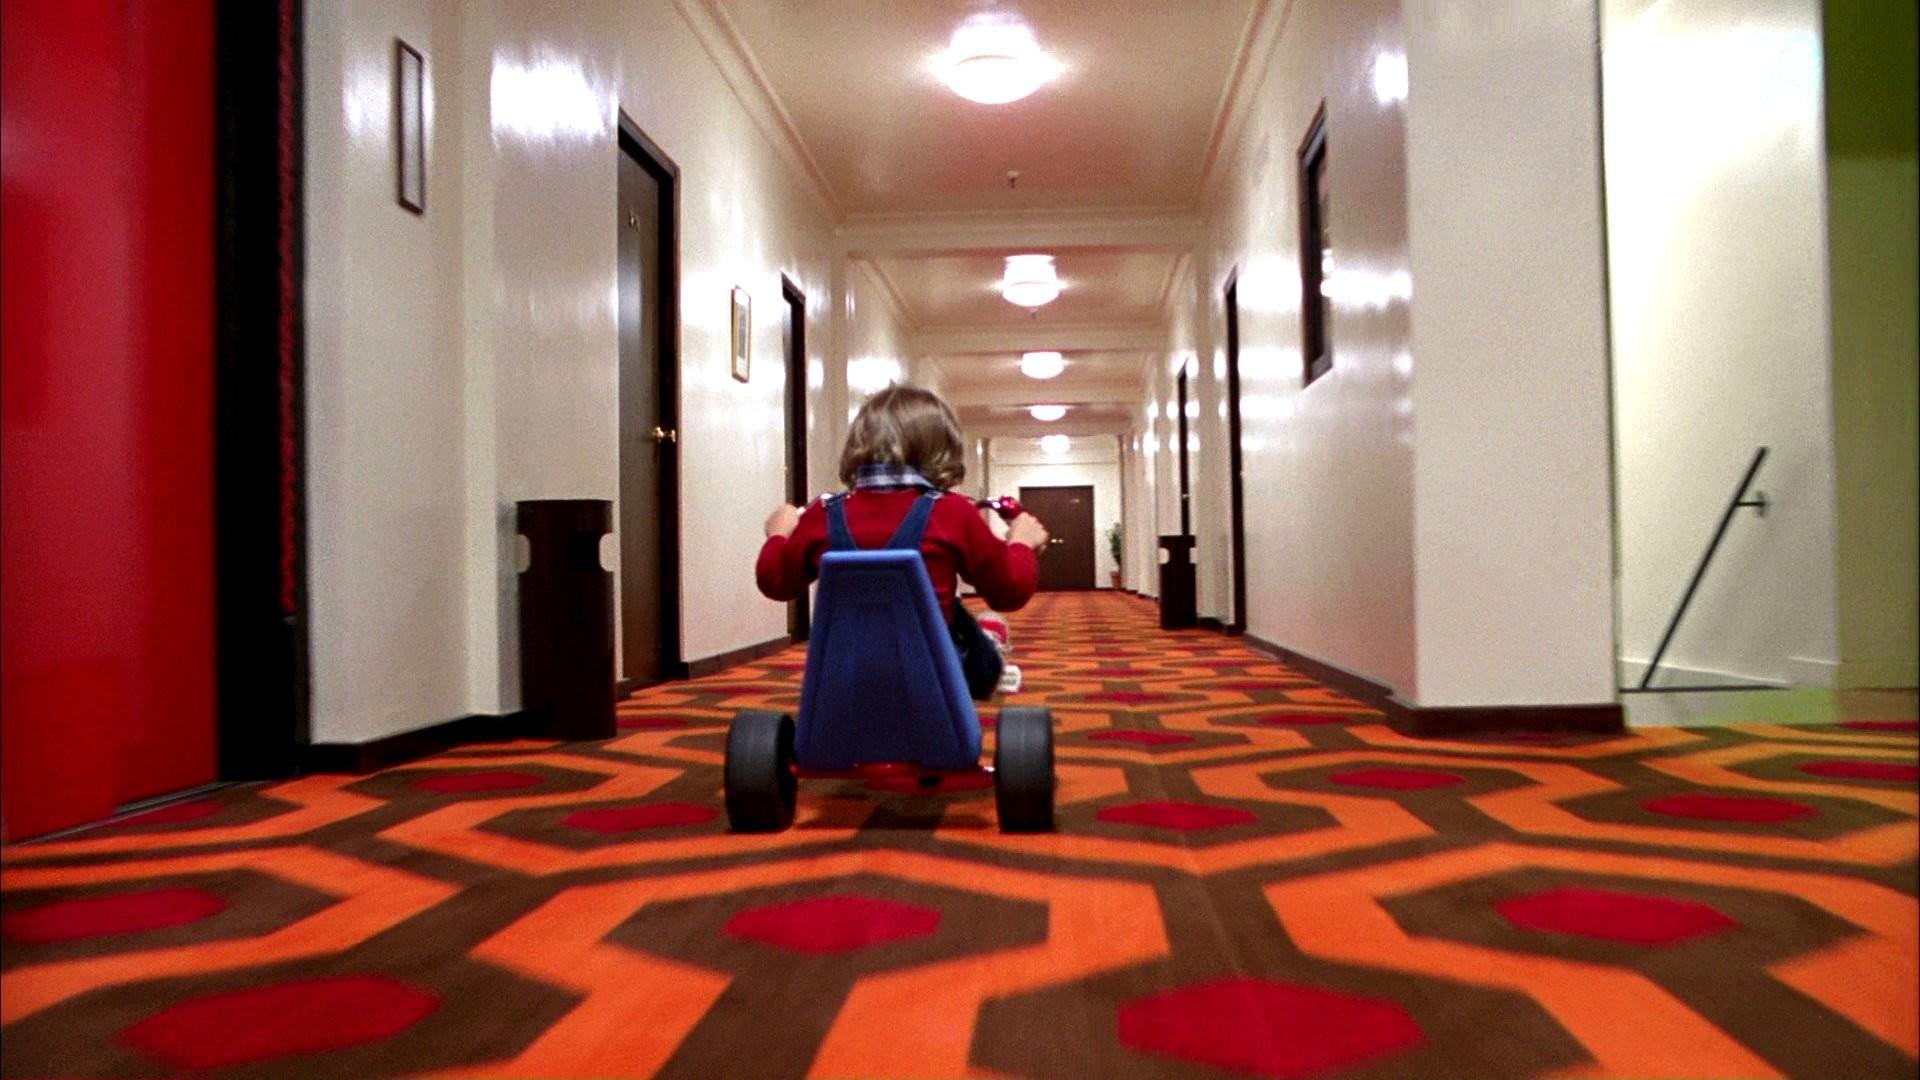 THE SHINING horror thriller dark movie film classic wallpaper | |  253379 | WallpaperUP